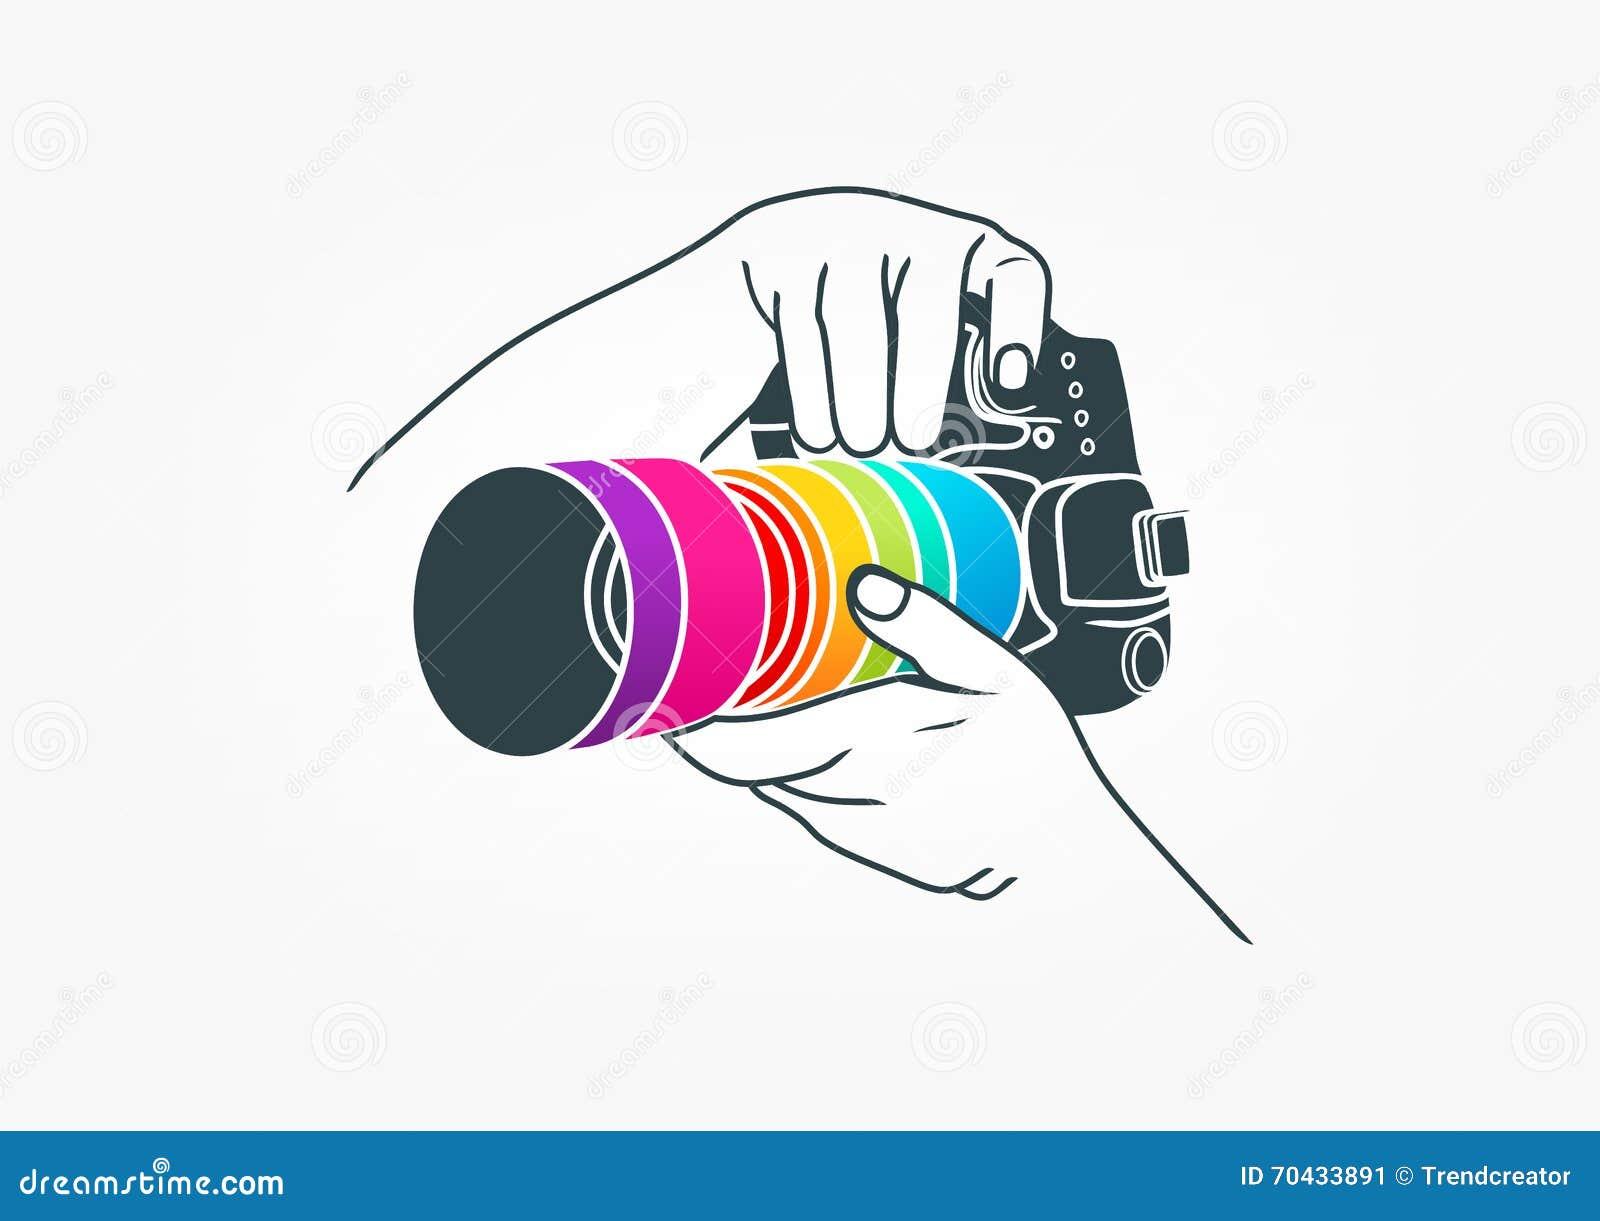 Fotografielogo, Kamerakonzeptdesign